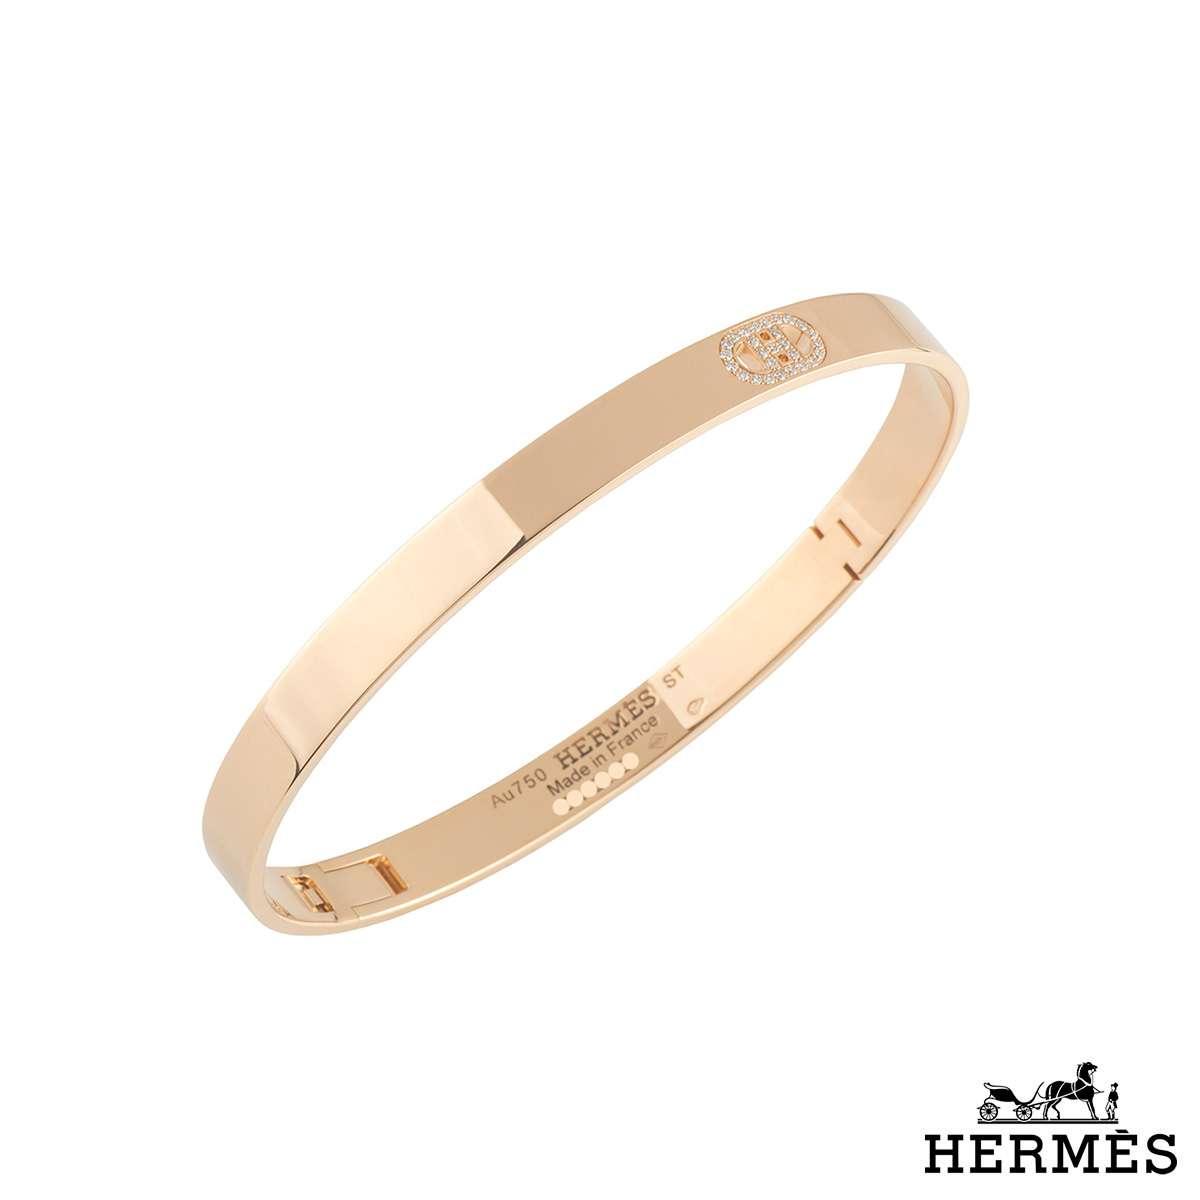 Hermes Rose Gold Diamond D Ancre Bangle 0.07ct F-G/VVS